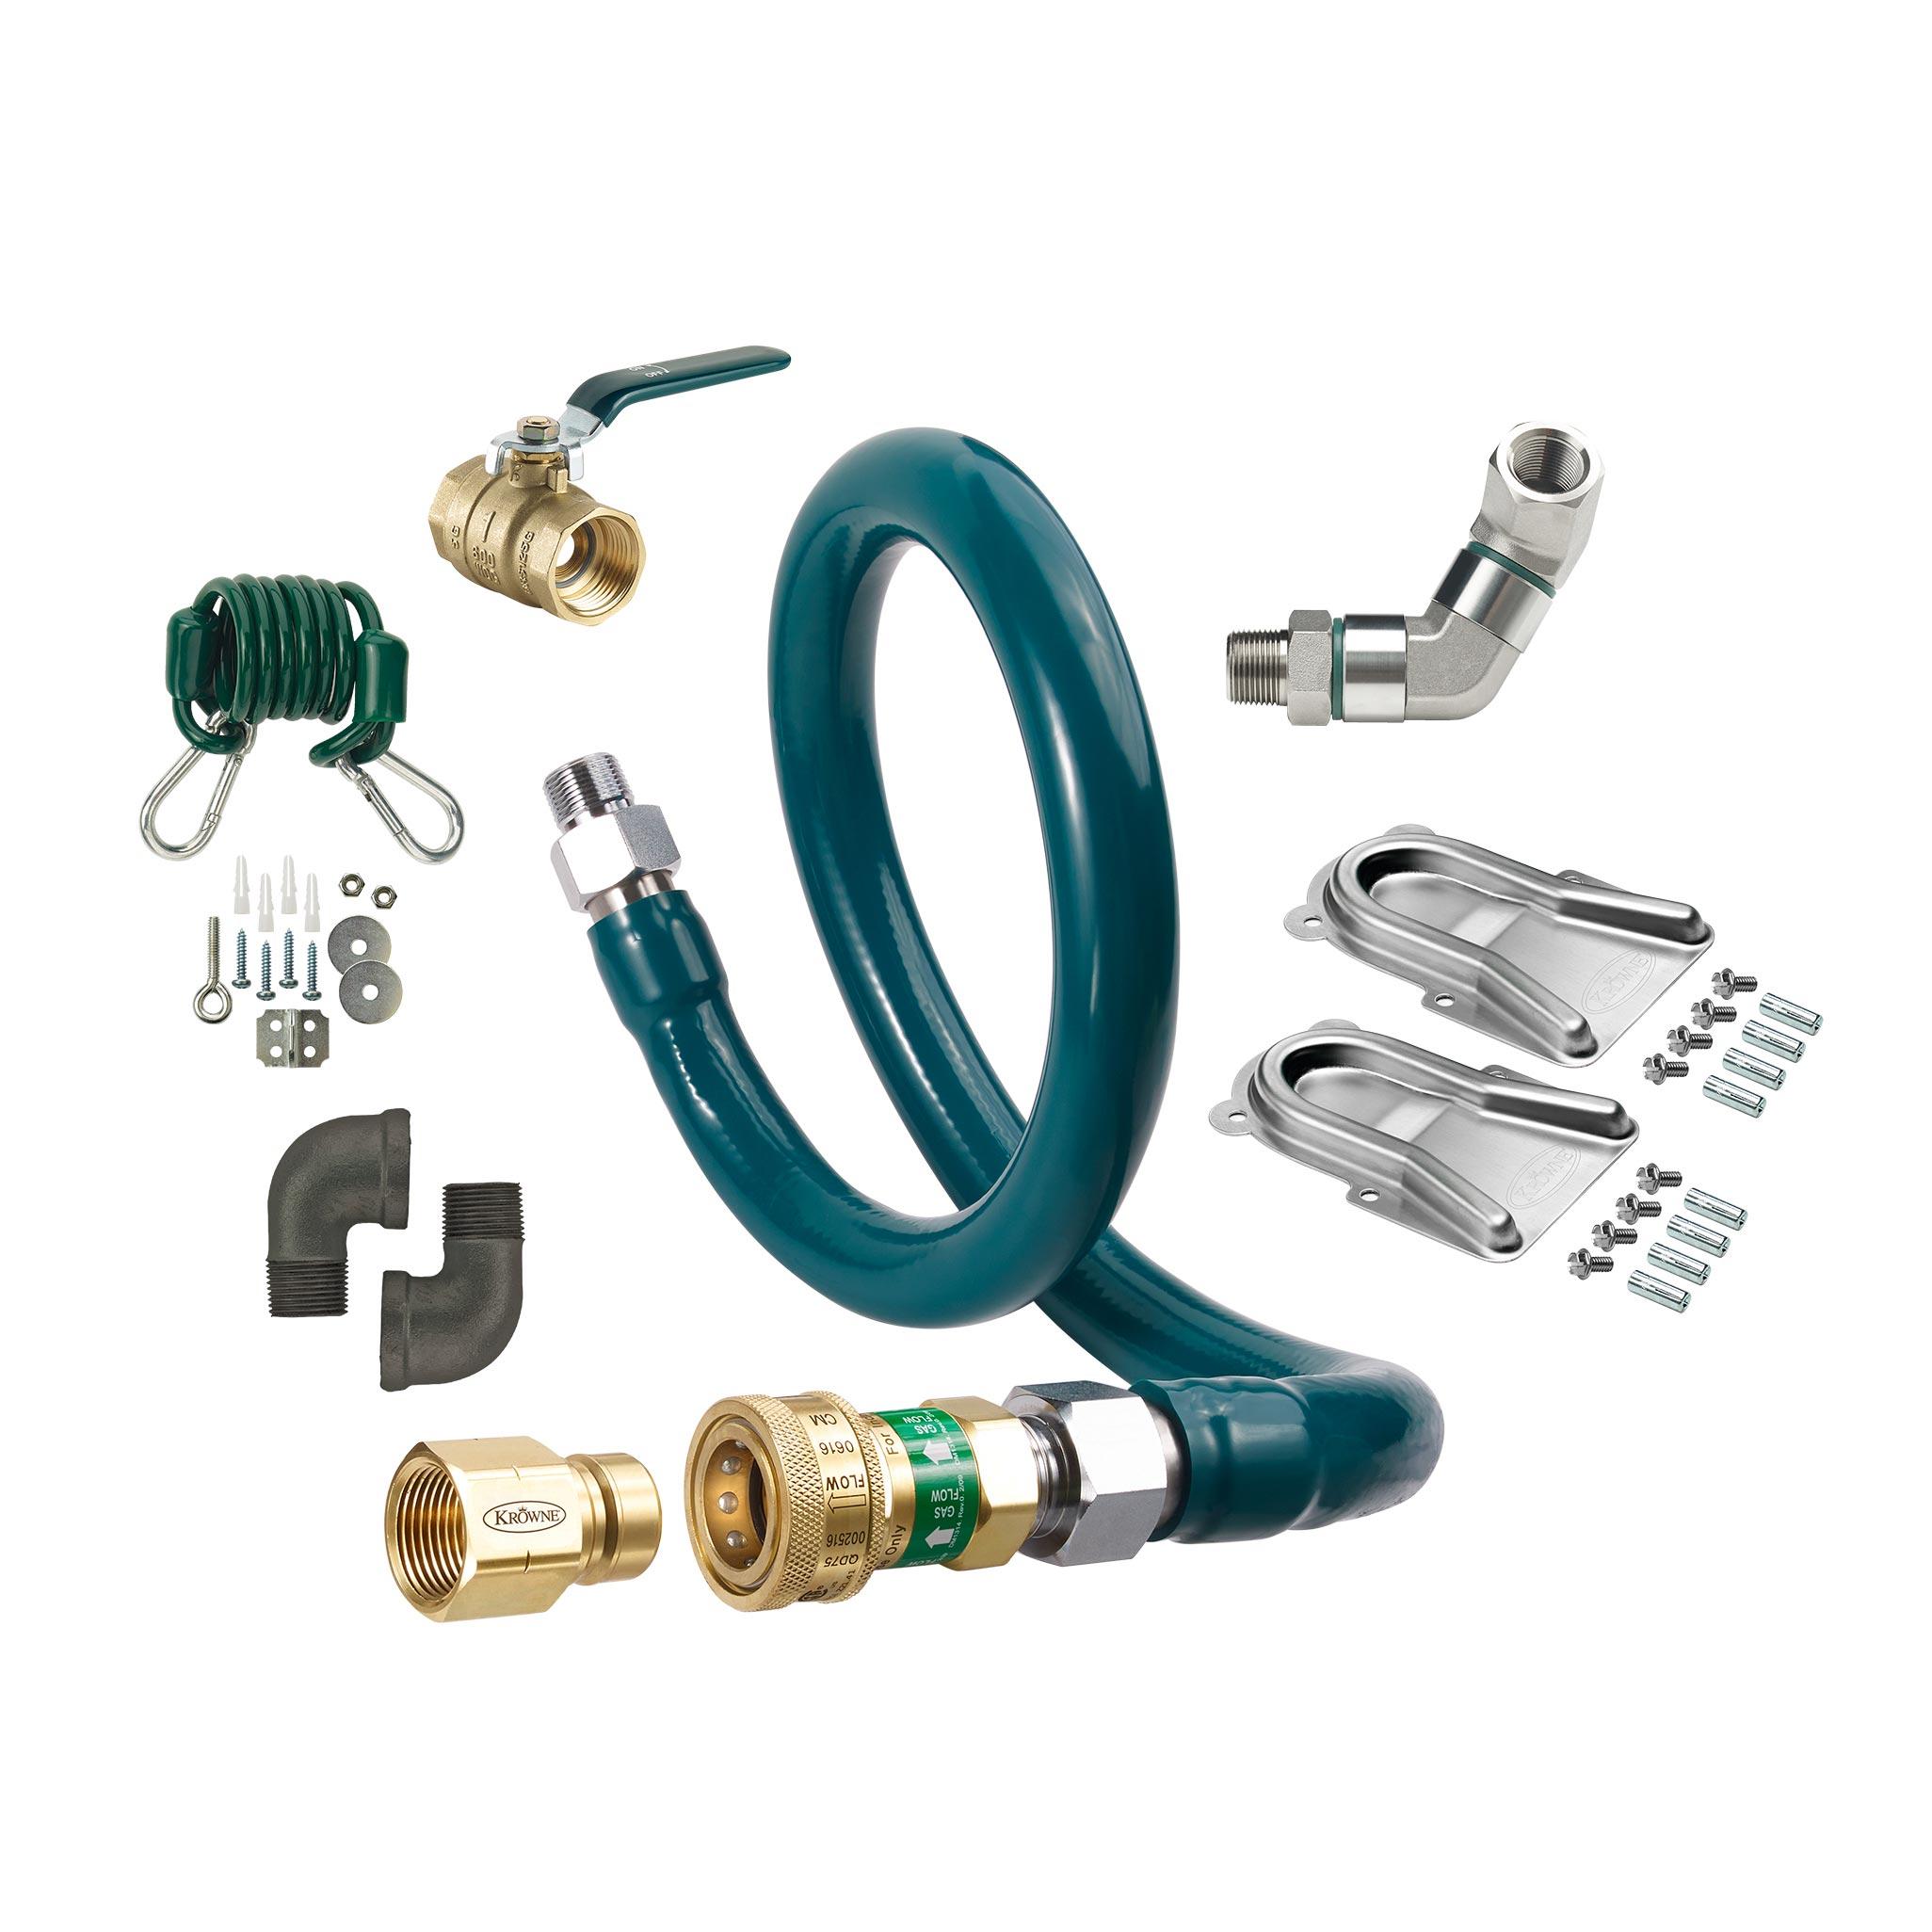 Krowne Metal M5036K11 gas connector hose kit